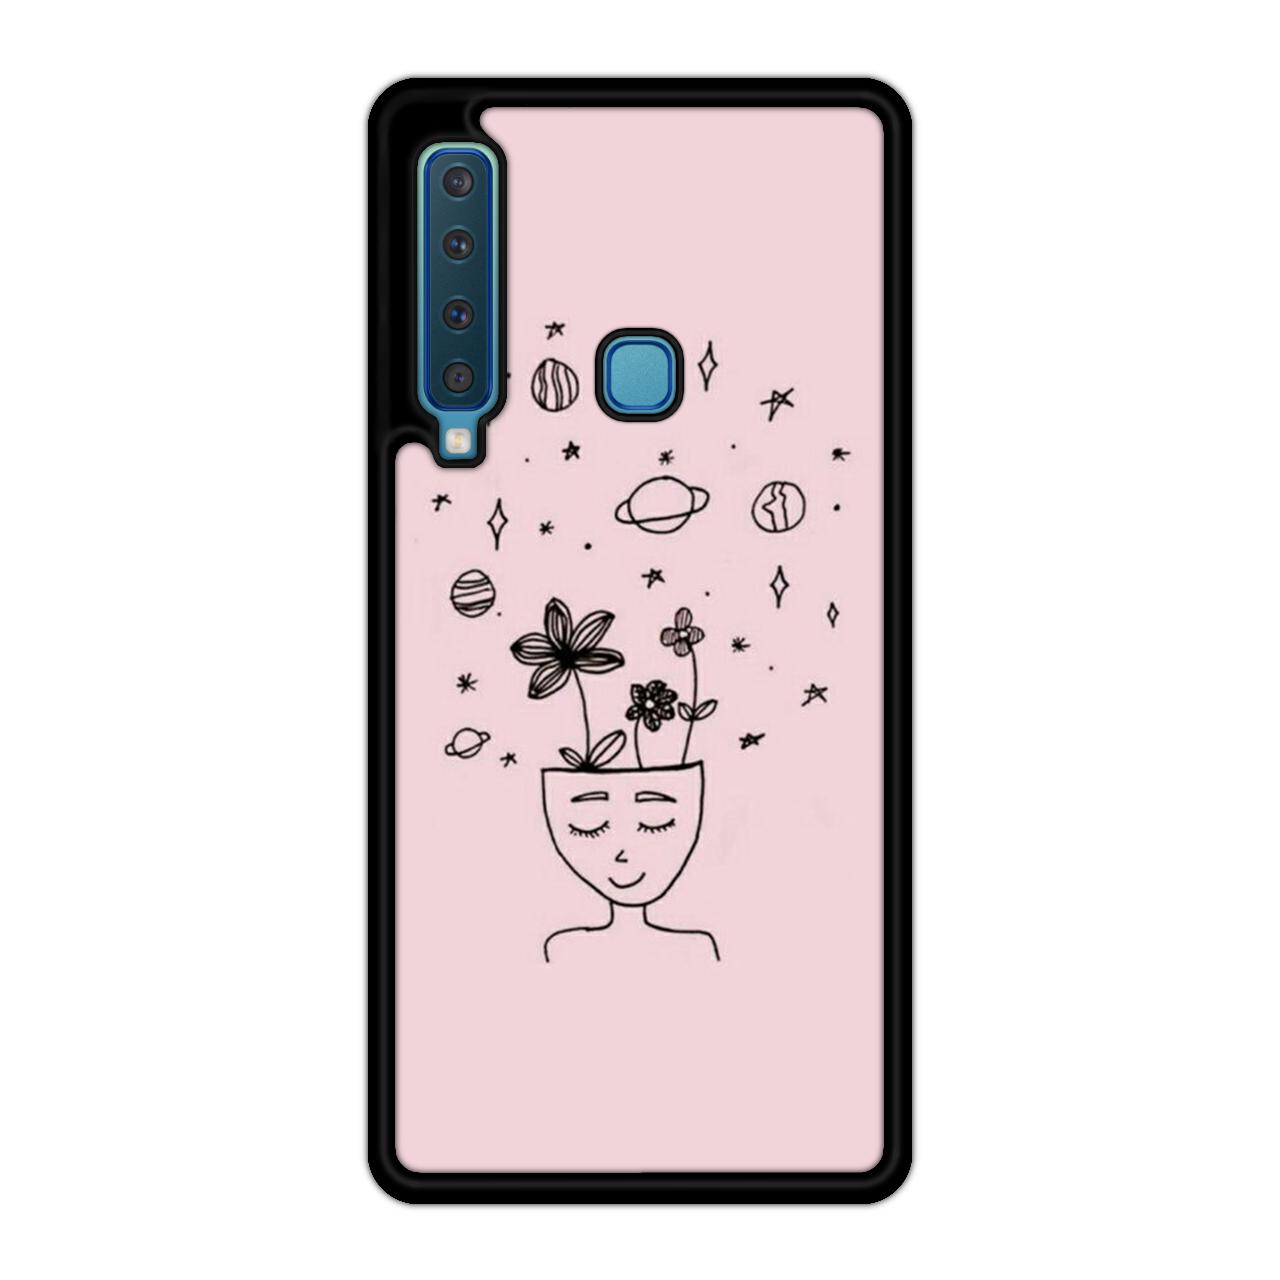 کاور آکام مدل Aanin2870 مناسب برای گوشی موبایل سامسونگ Galaxy A9 2018